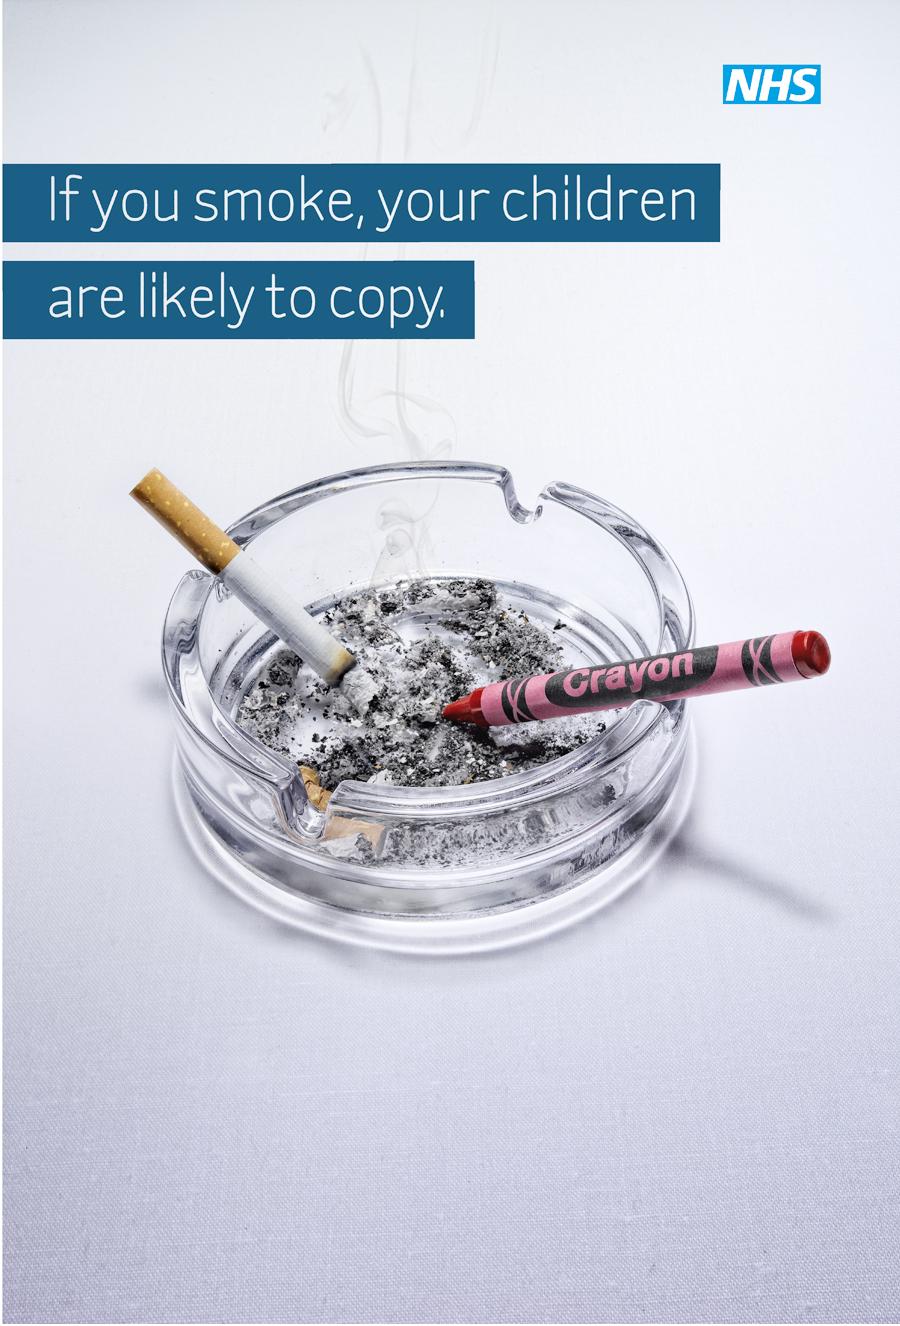 COI 'Smoke Free' Miles Calcraft Briginshaw Duffy